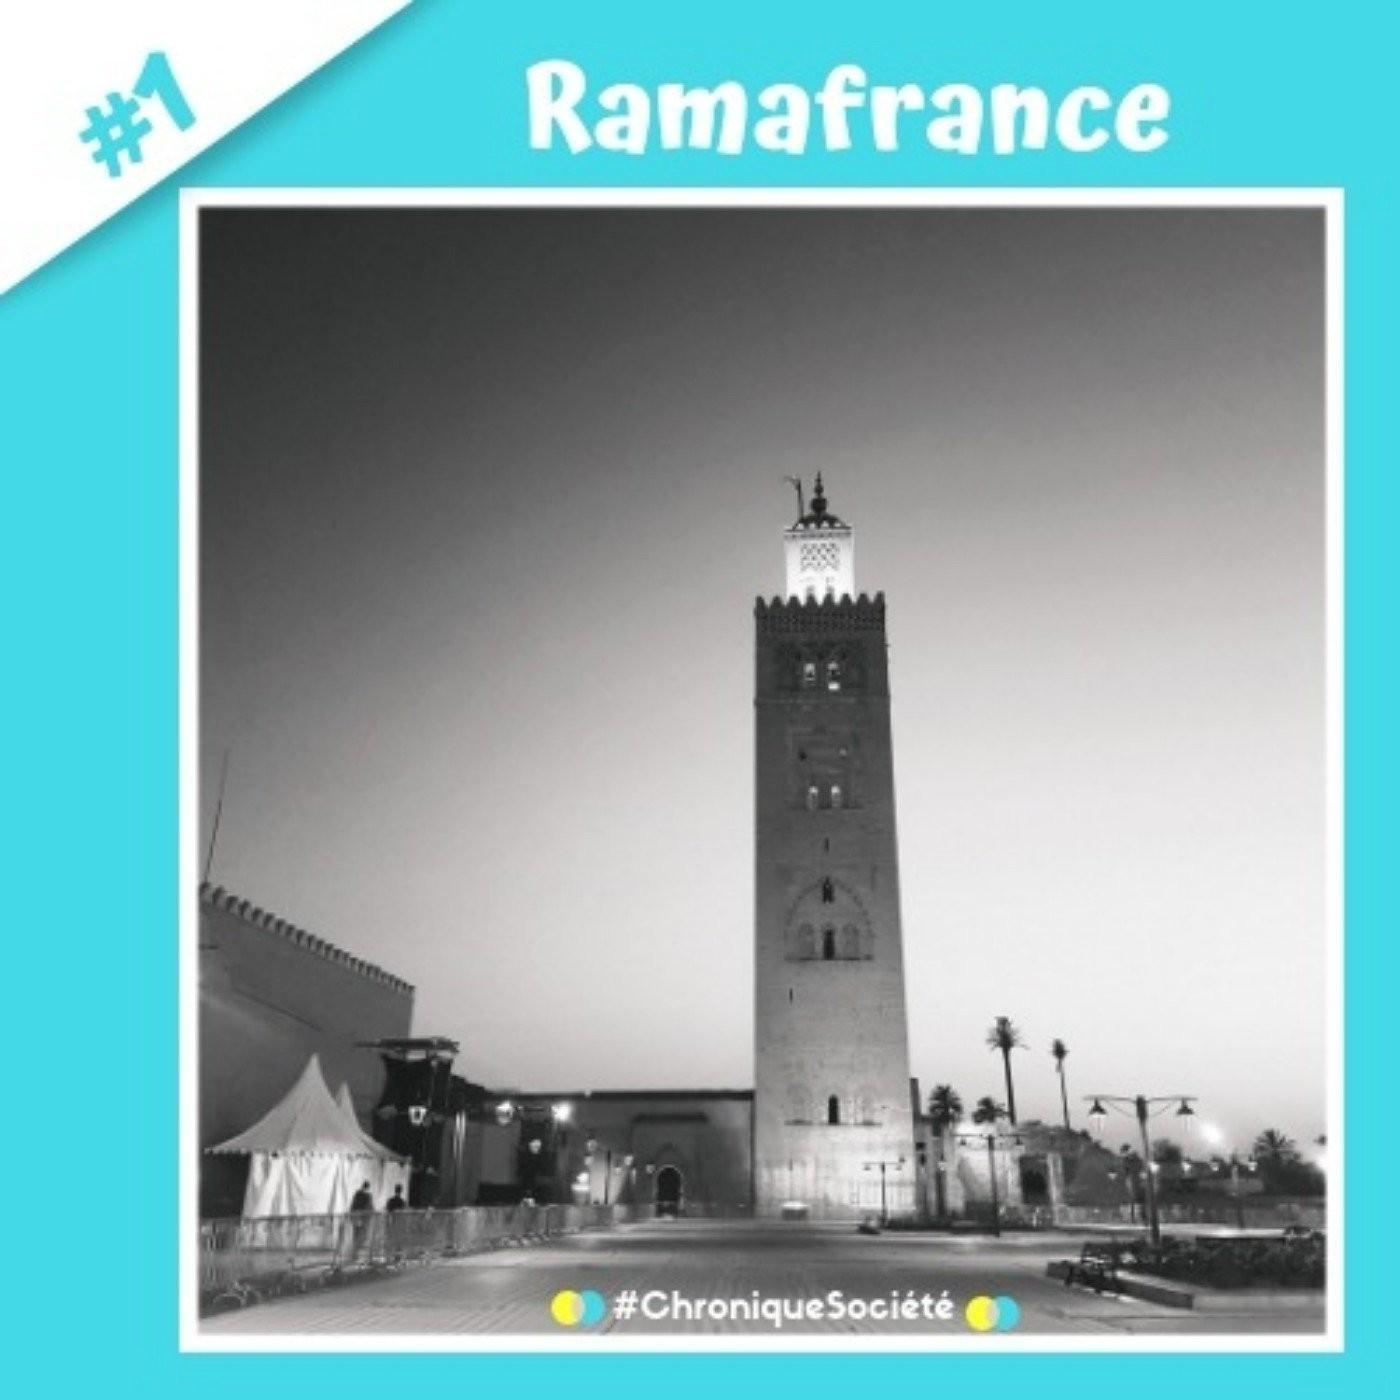 Chronique #1 : Ramafrance